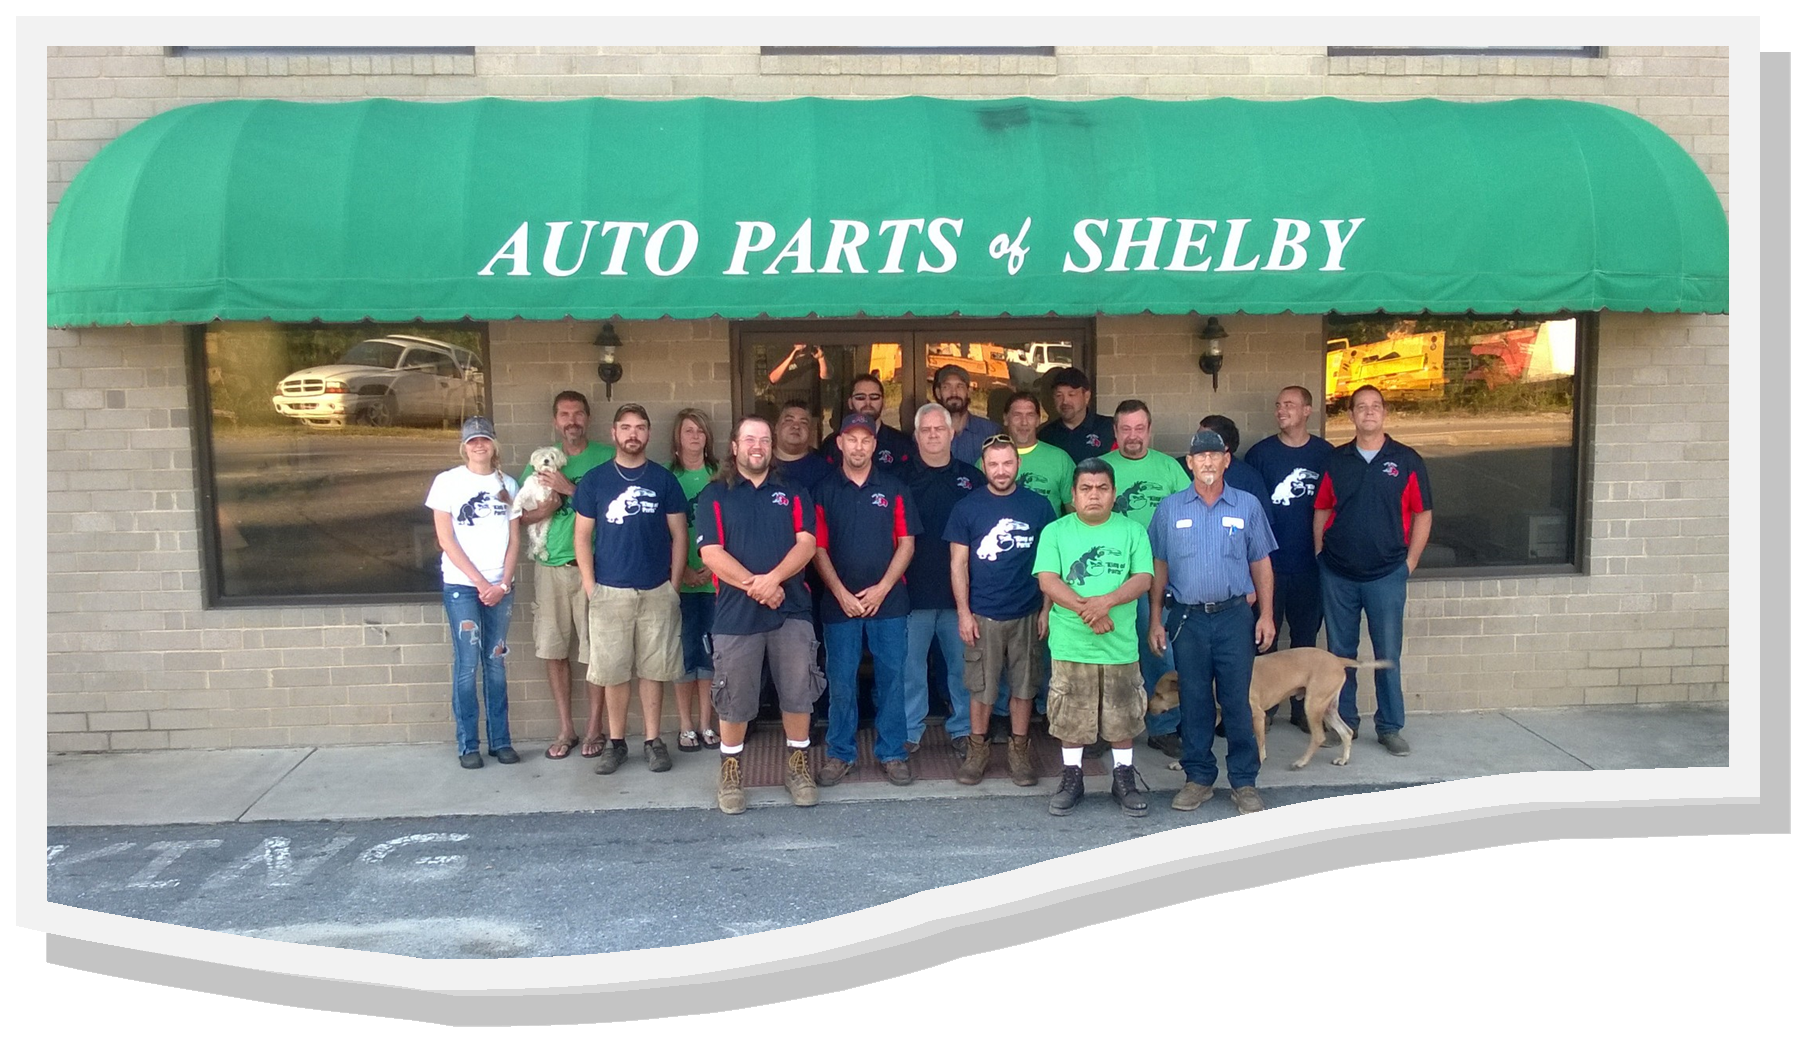 Auto Parts of Shelby Crew